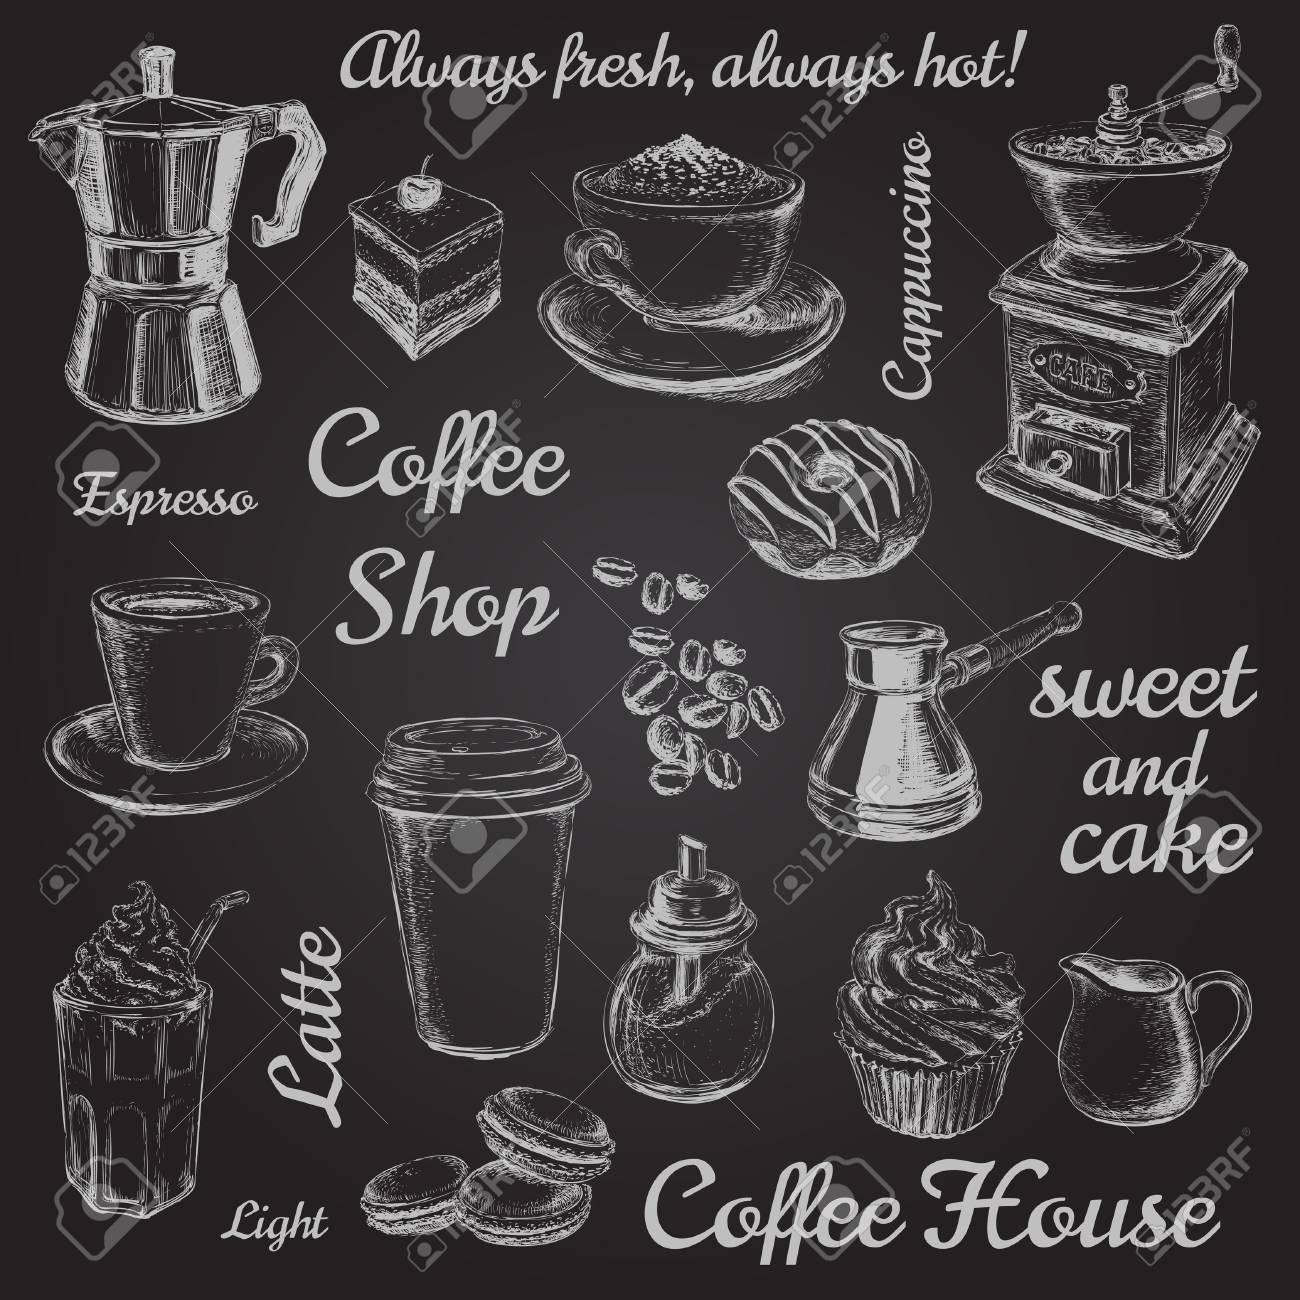 Coffee illustration - 53274697